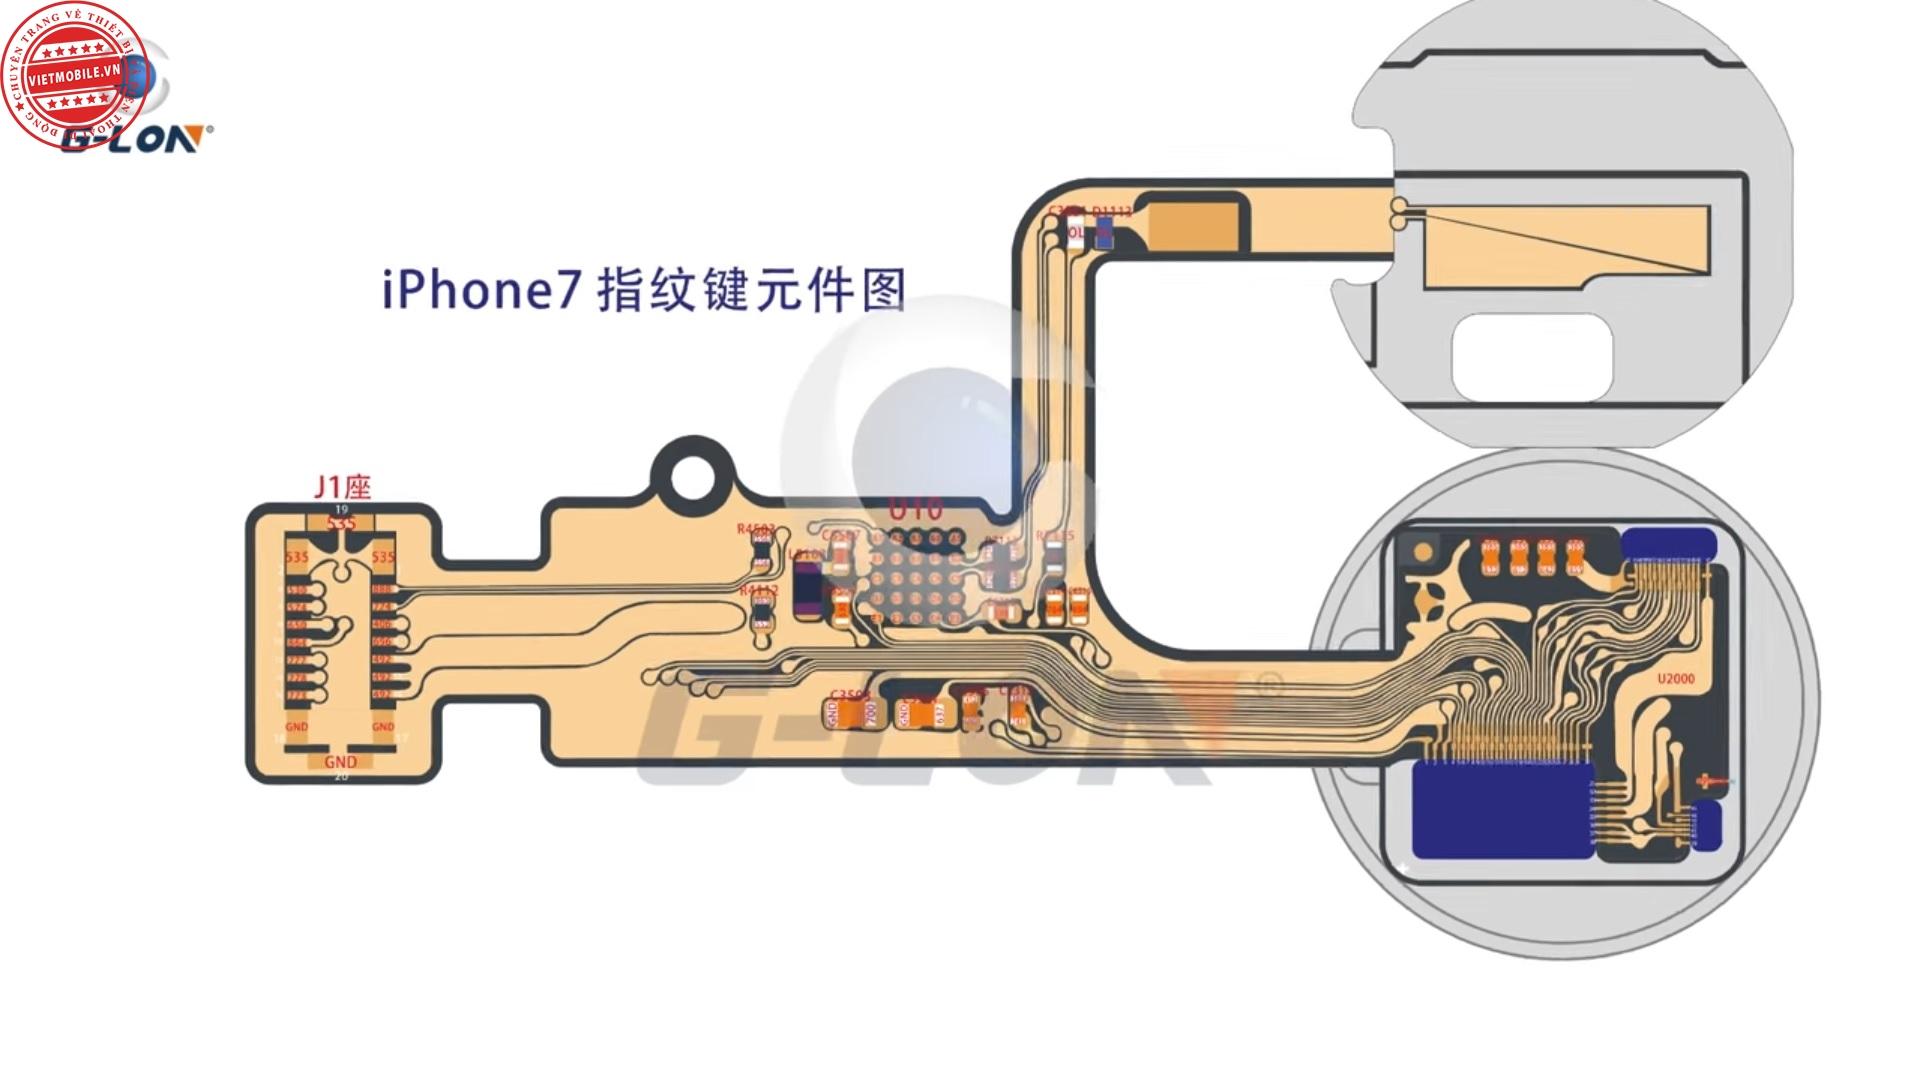 Chia sẻ - Sơ đồ mạch touch ID của iPhone 7 (iPhone 7 touch ...